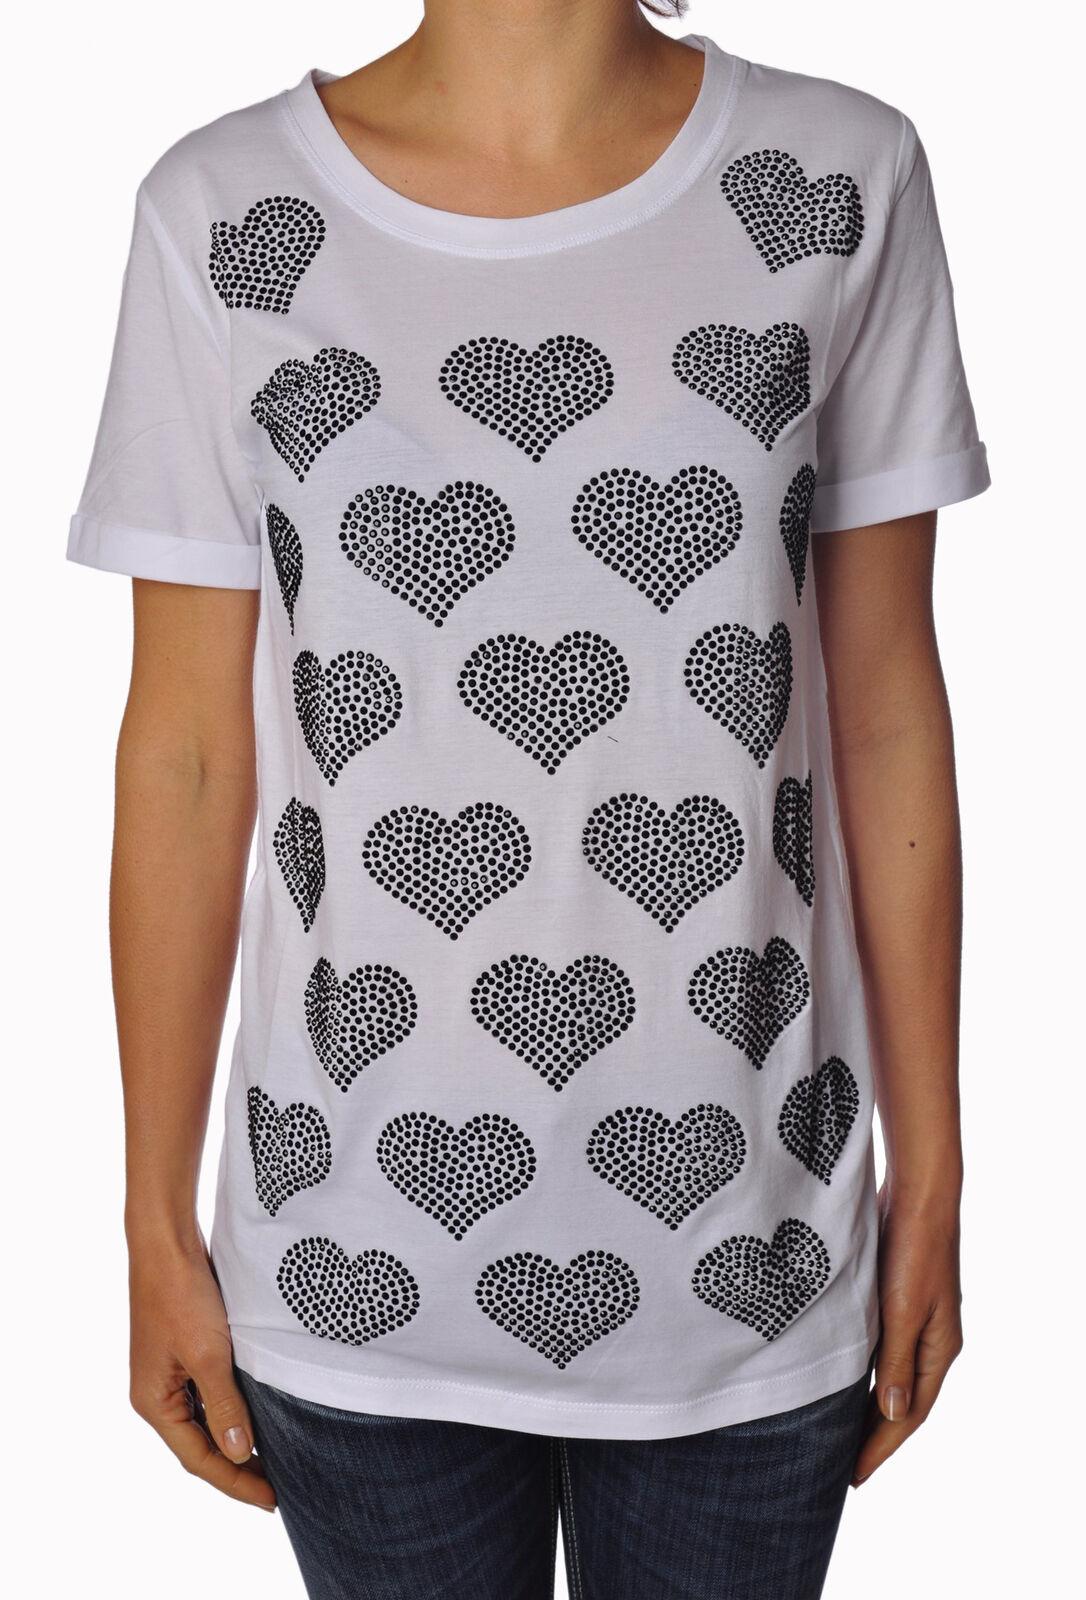 Twin Set - Topwear-T-shirts - frau - 782417C185135